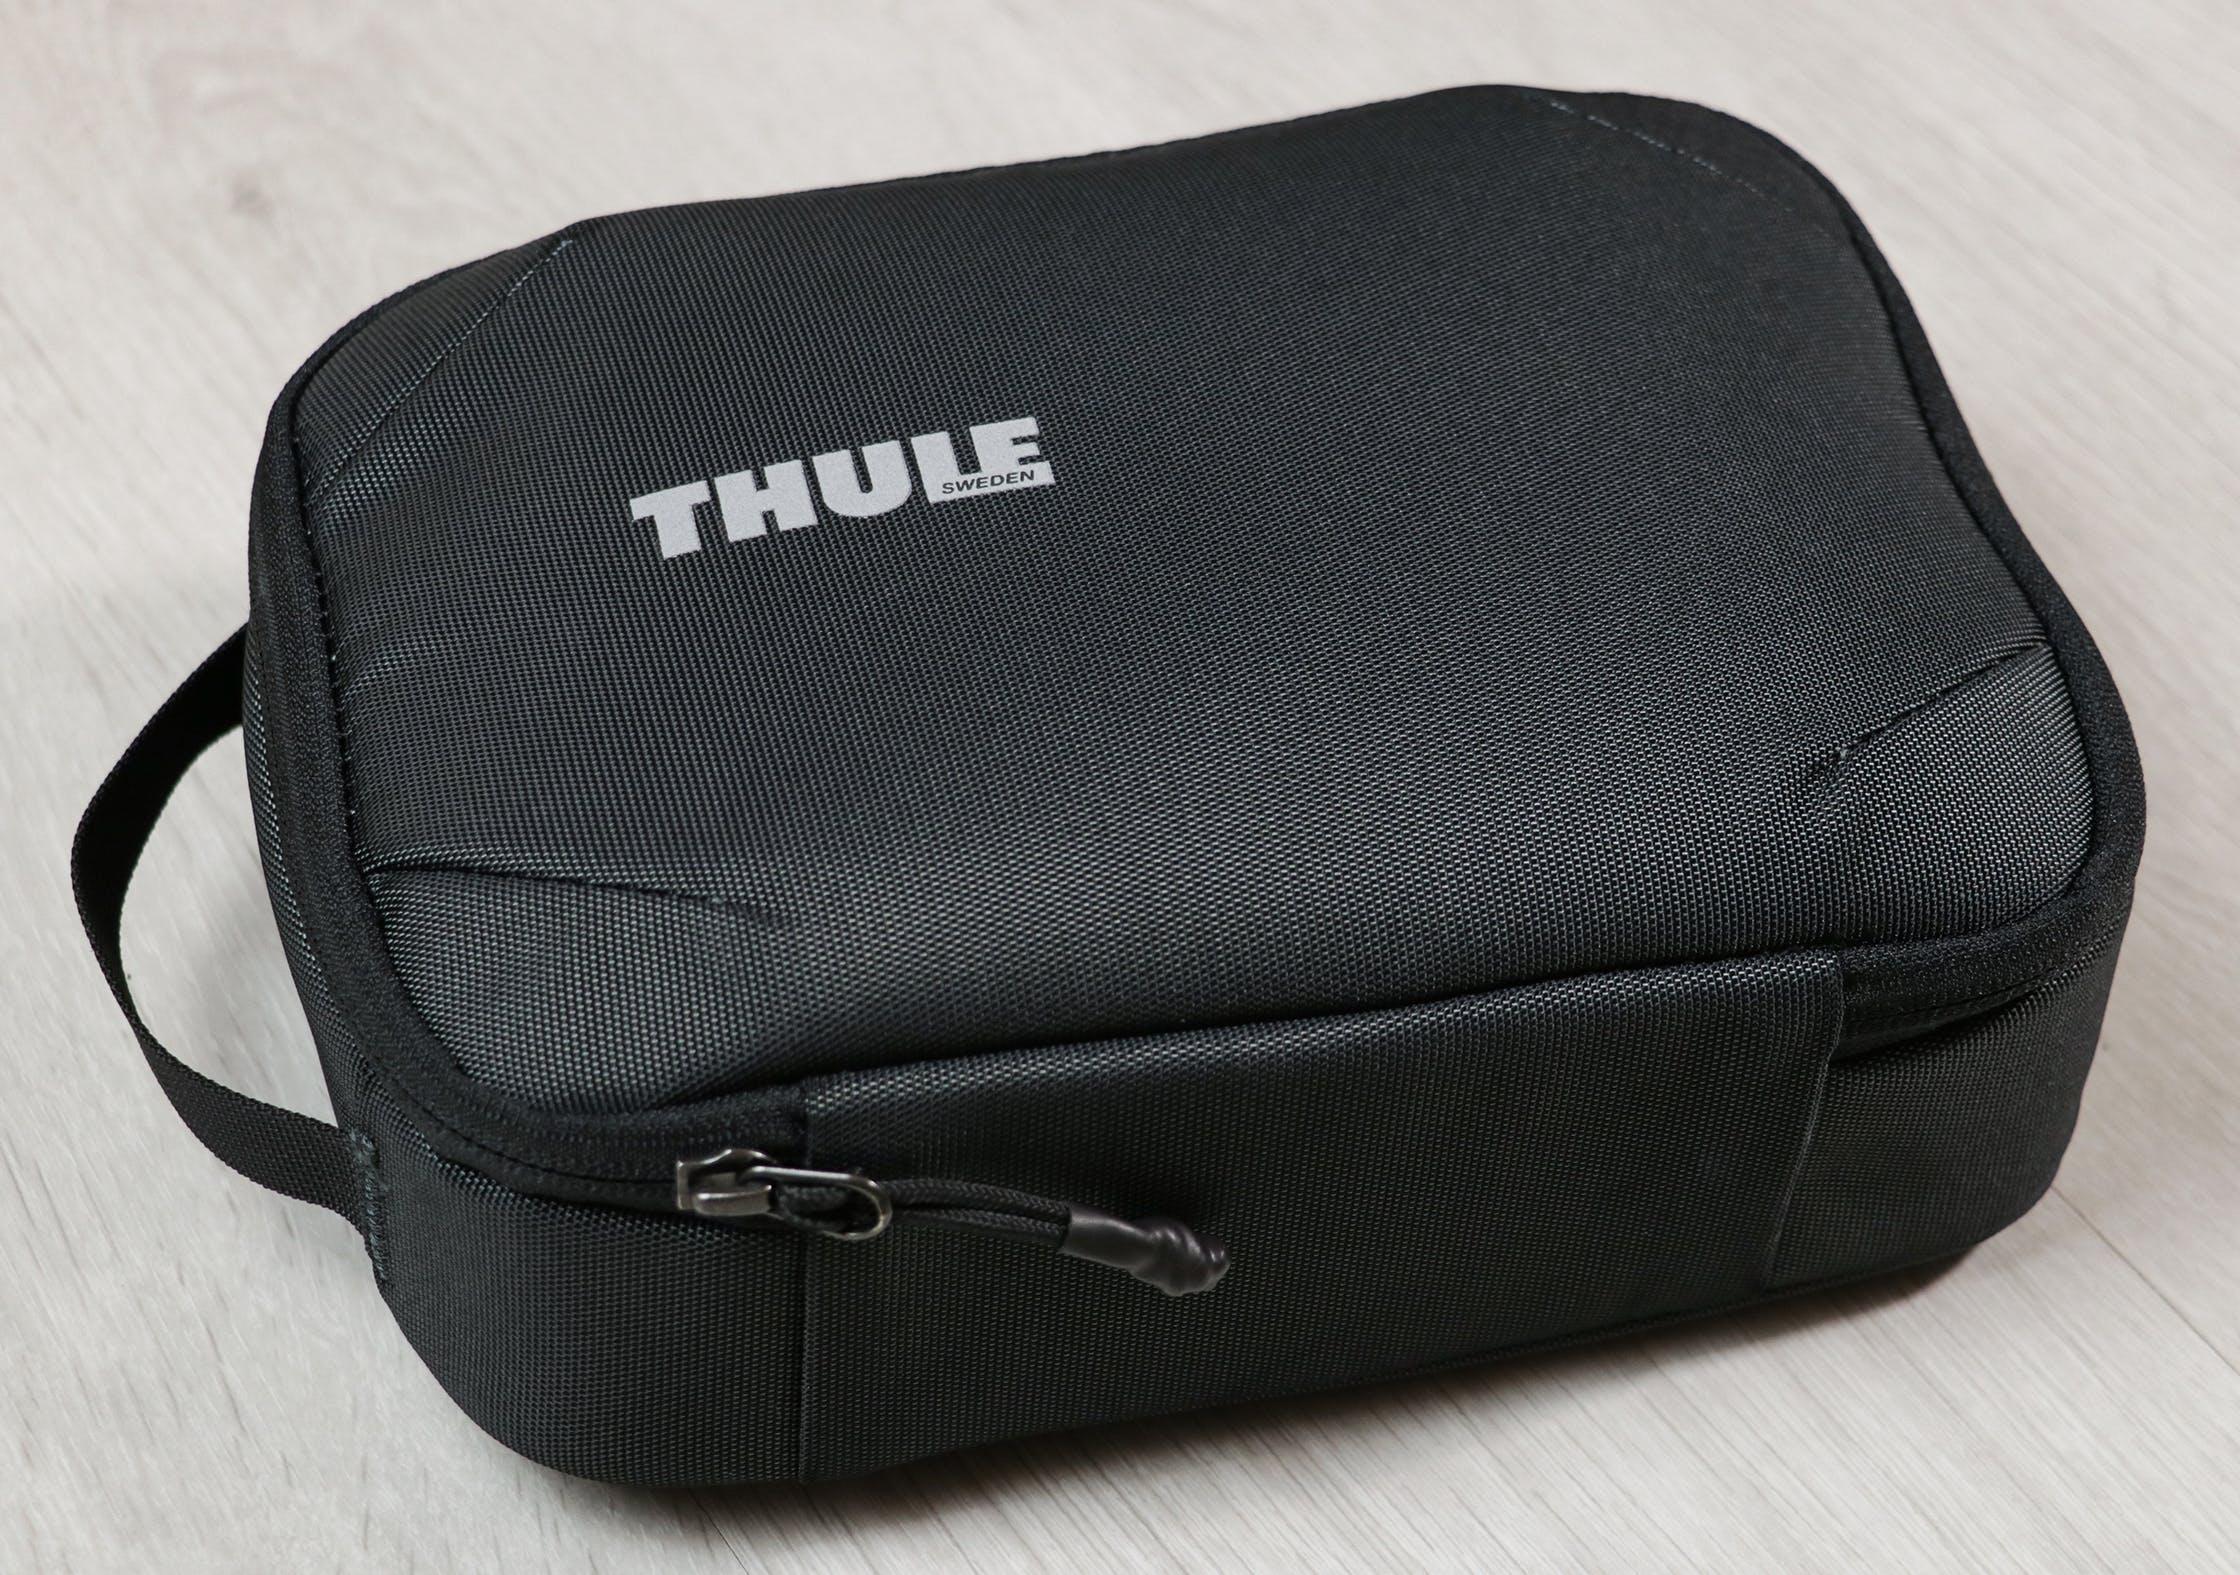 Thule Subterra Powershuttle Plus Minimal Design